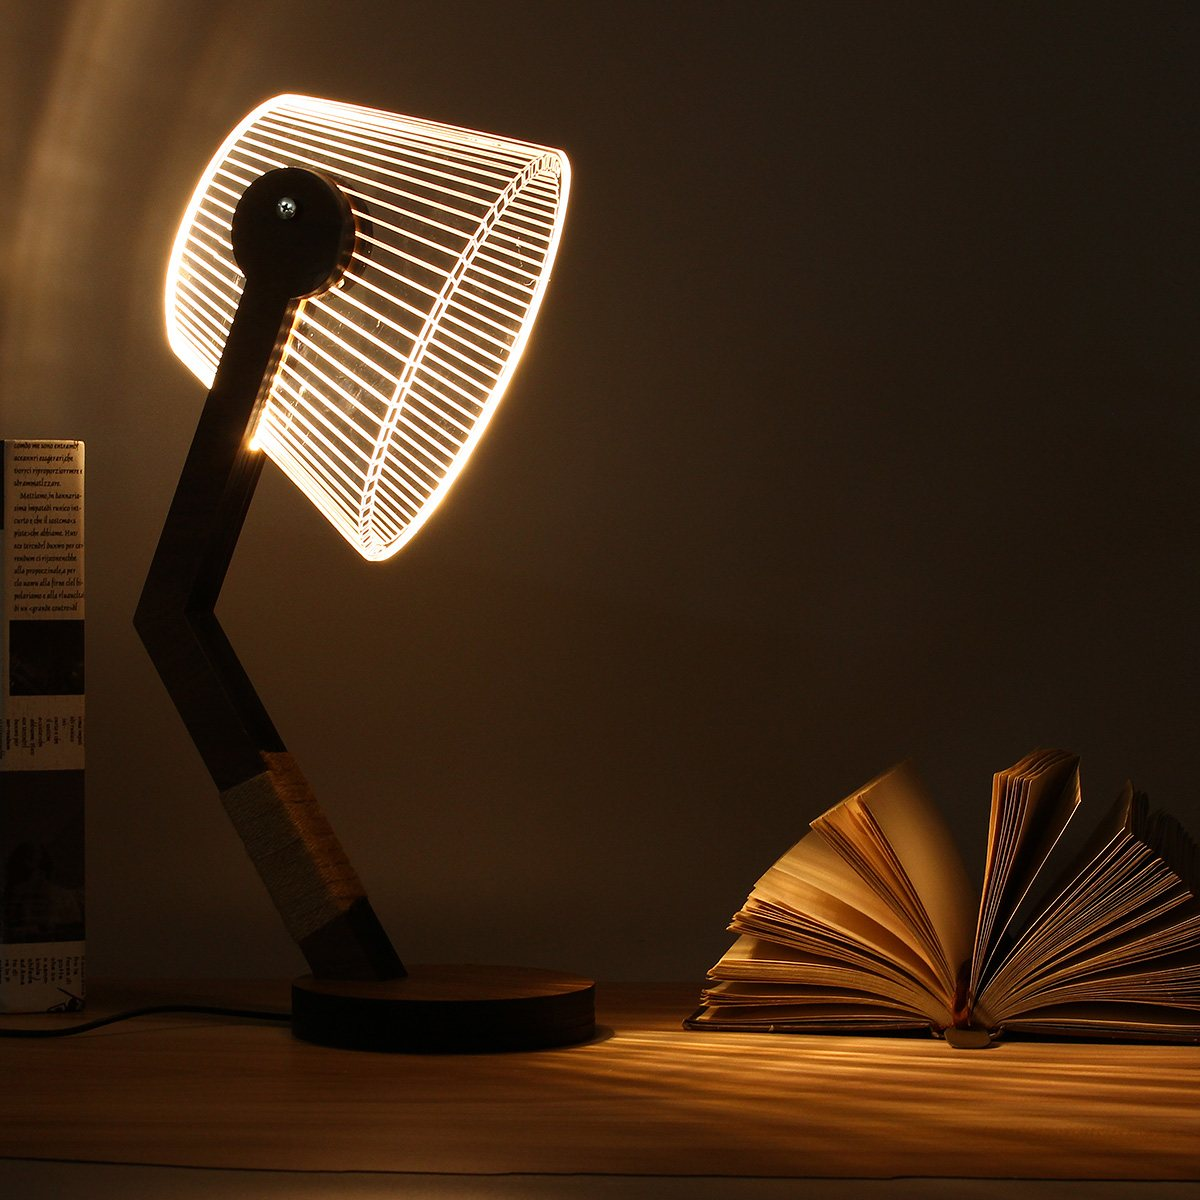 Adjustable 3D Wooden Stand Lamp Night Light Bedroom Table Desk ...